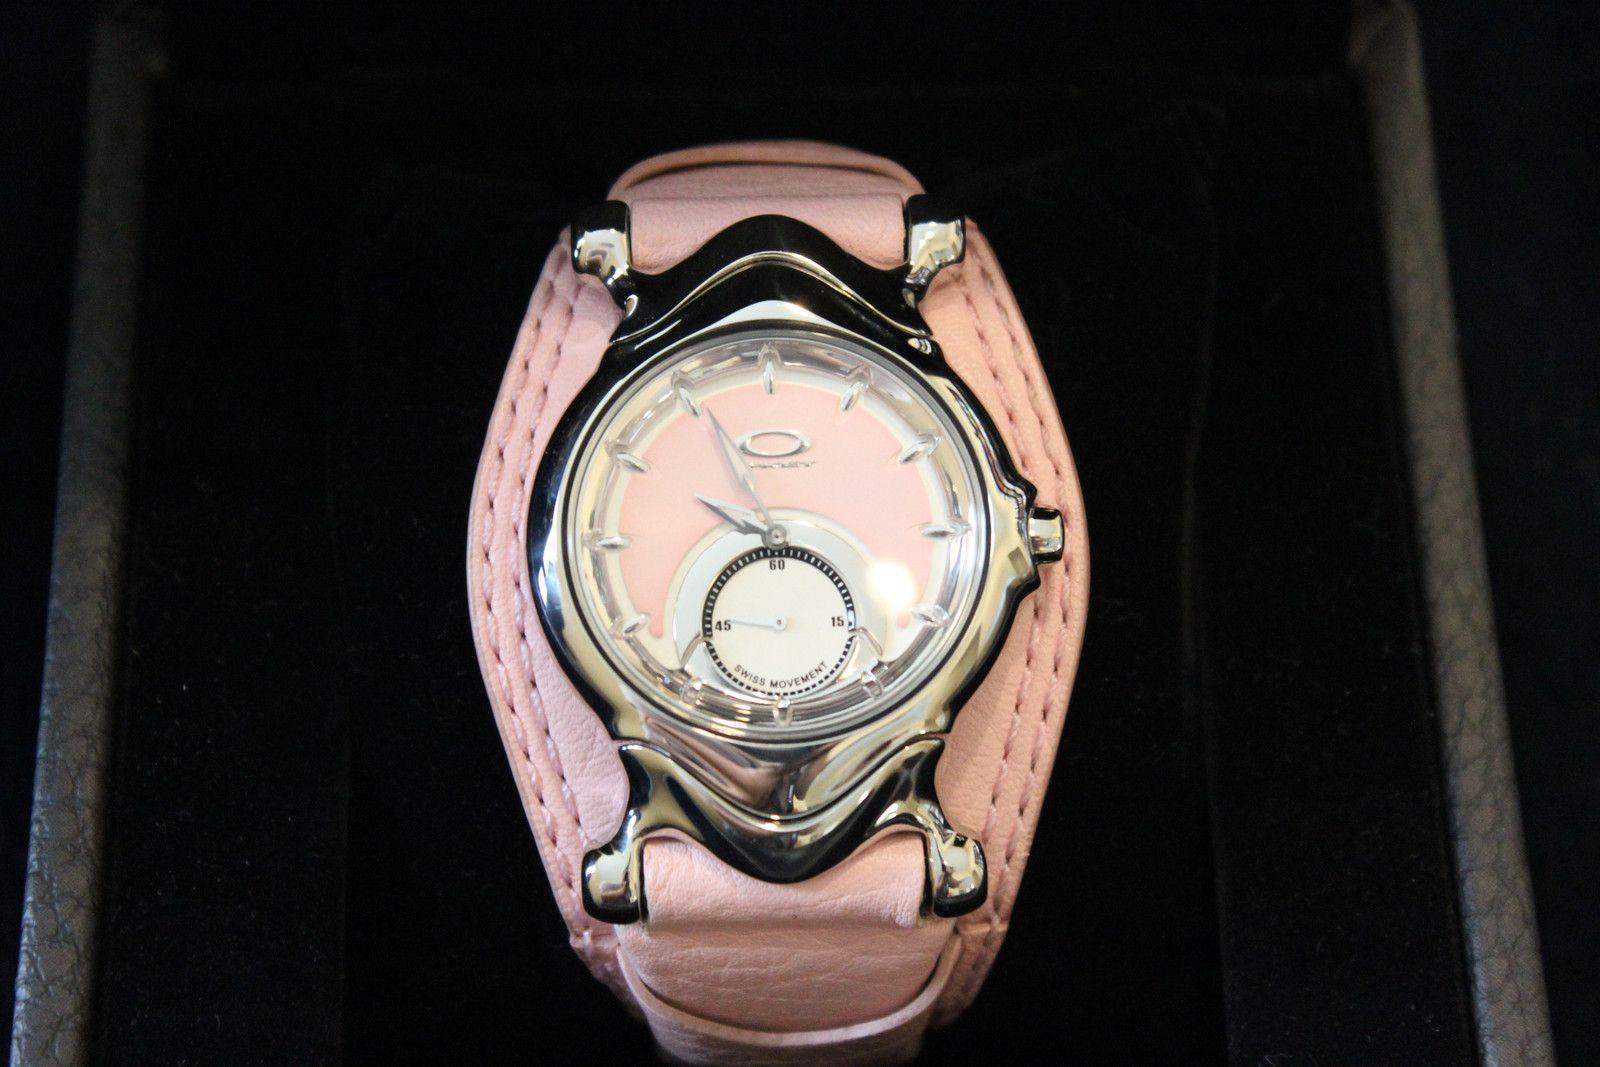 Jury - Polished/Sunburst Pink - Price Drop - vyskj3f.jpg